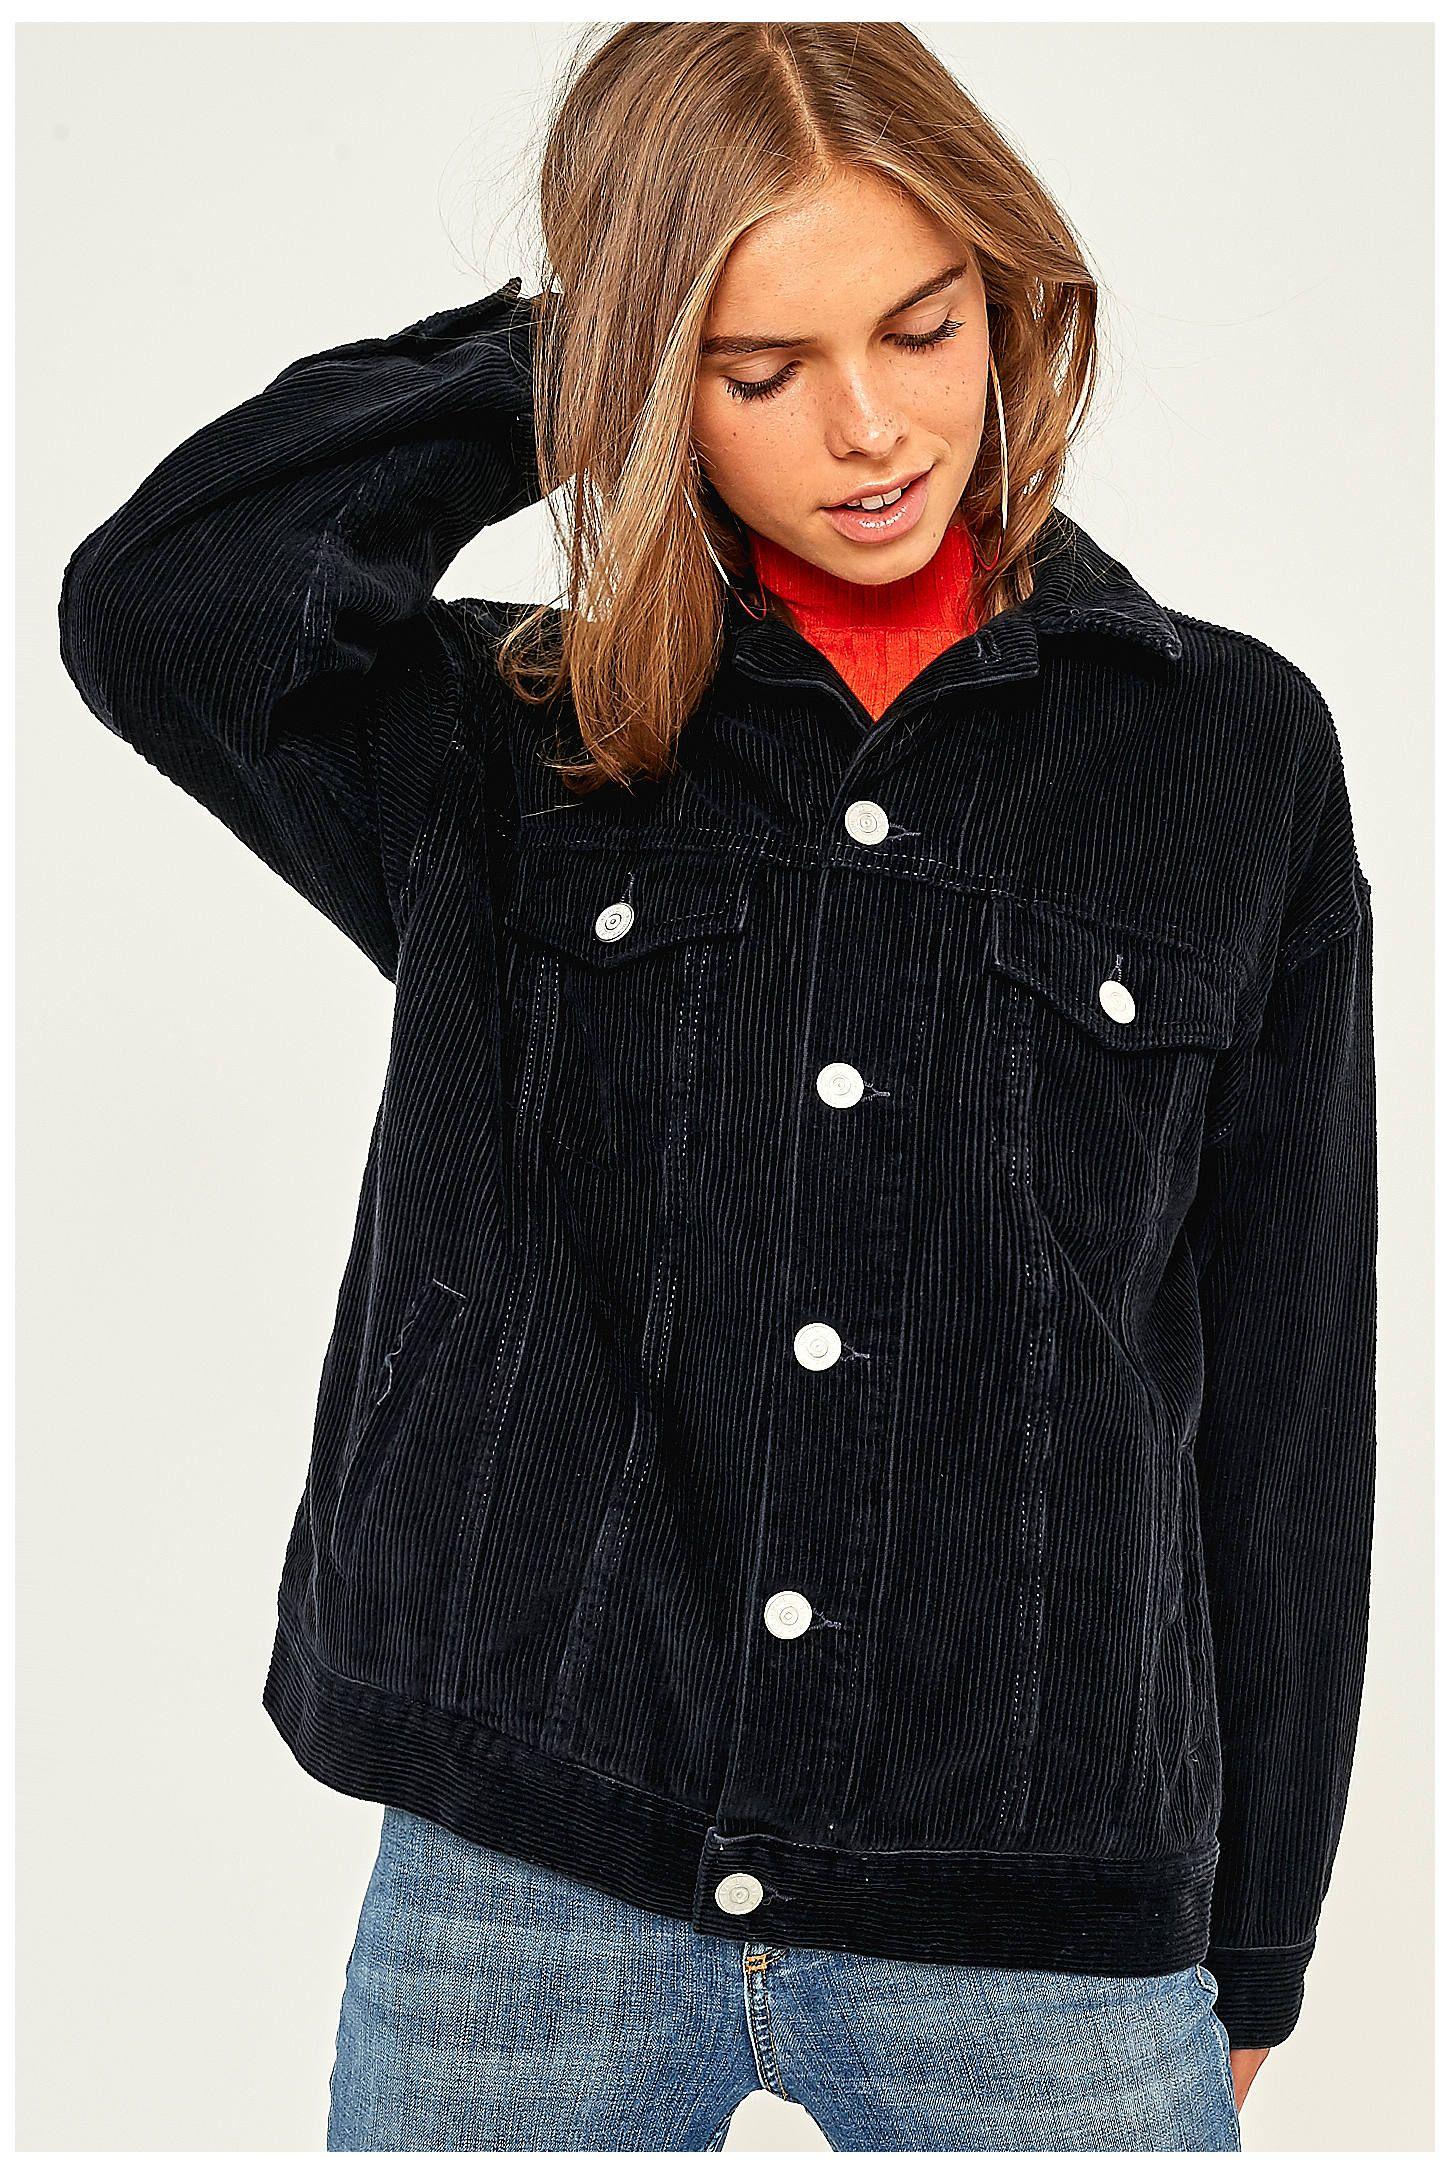 BDG Western Black Corduroy Jacket | Urban outfitters, Farben